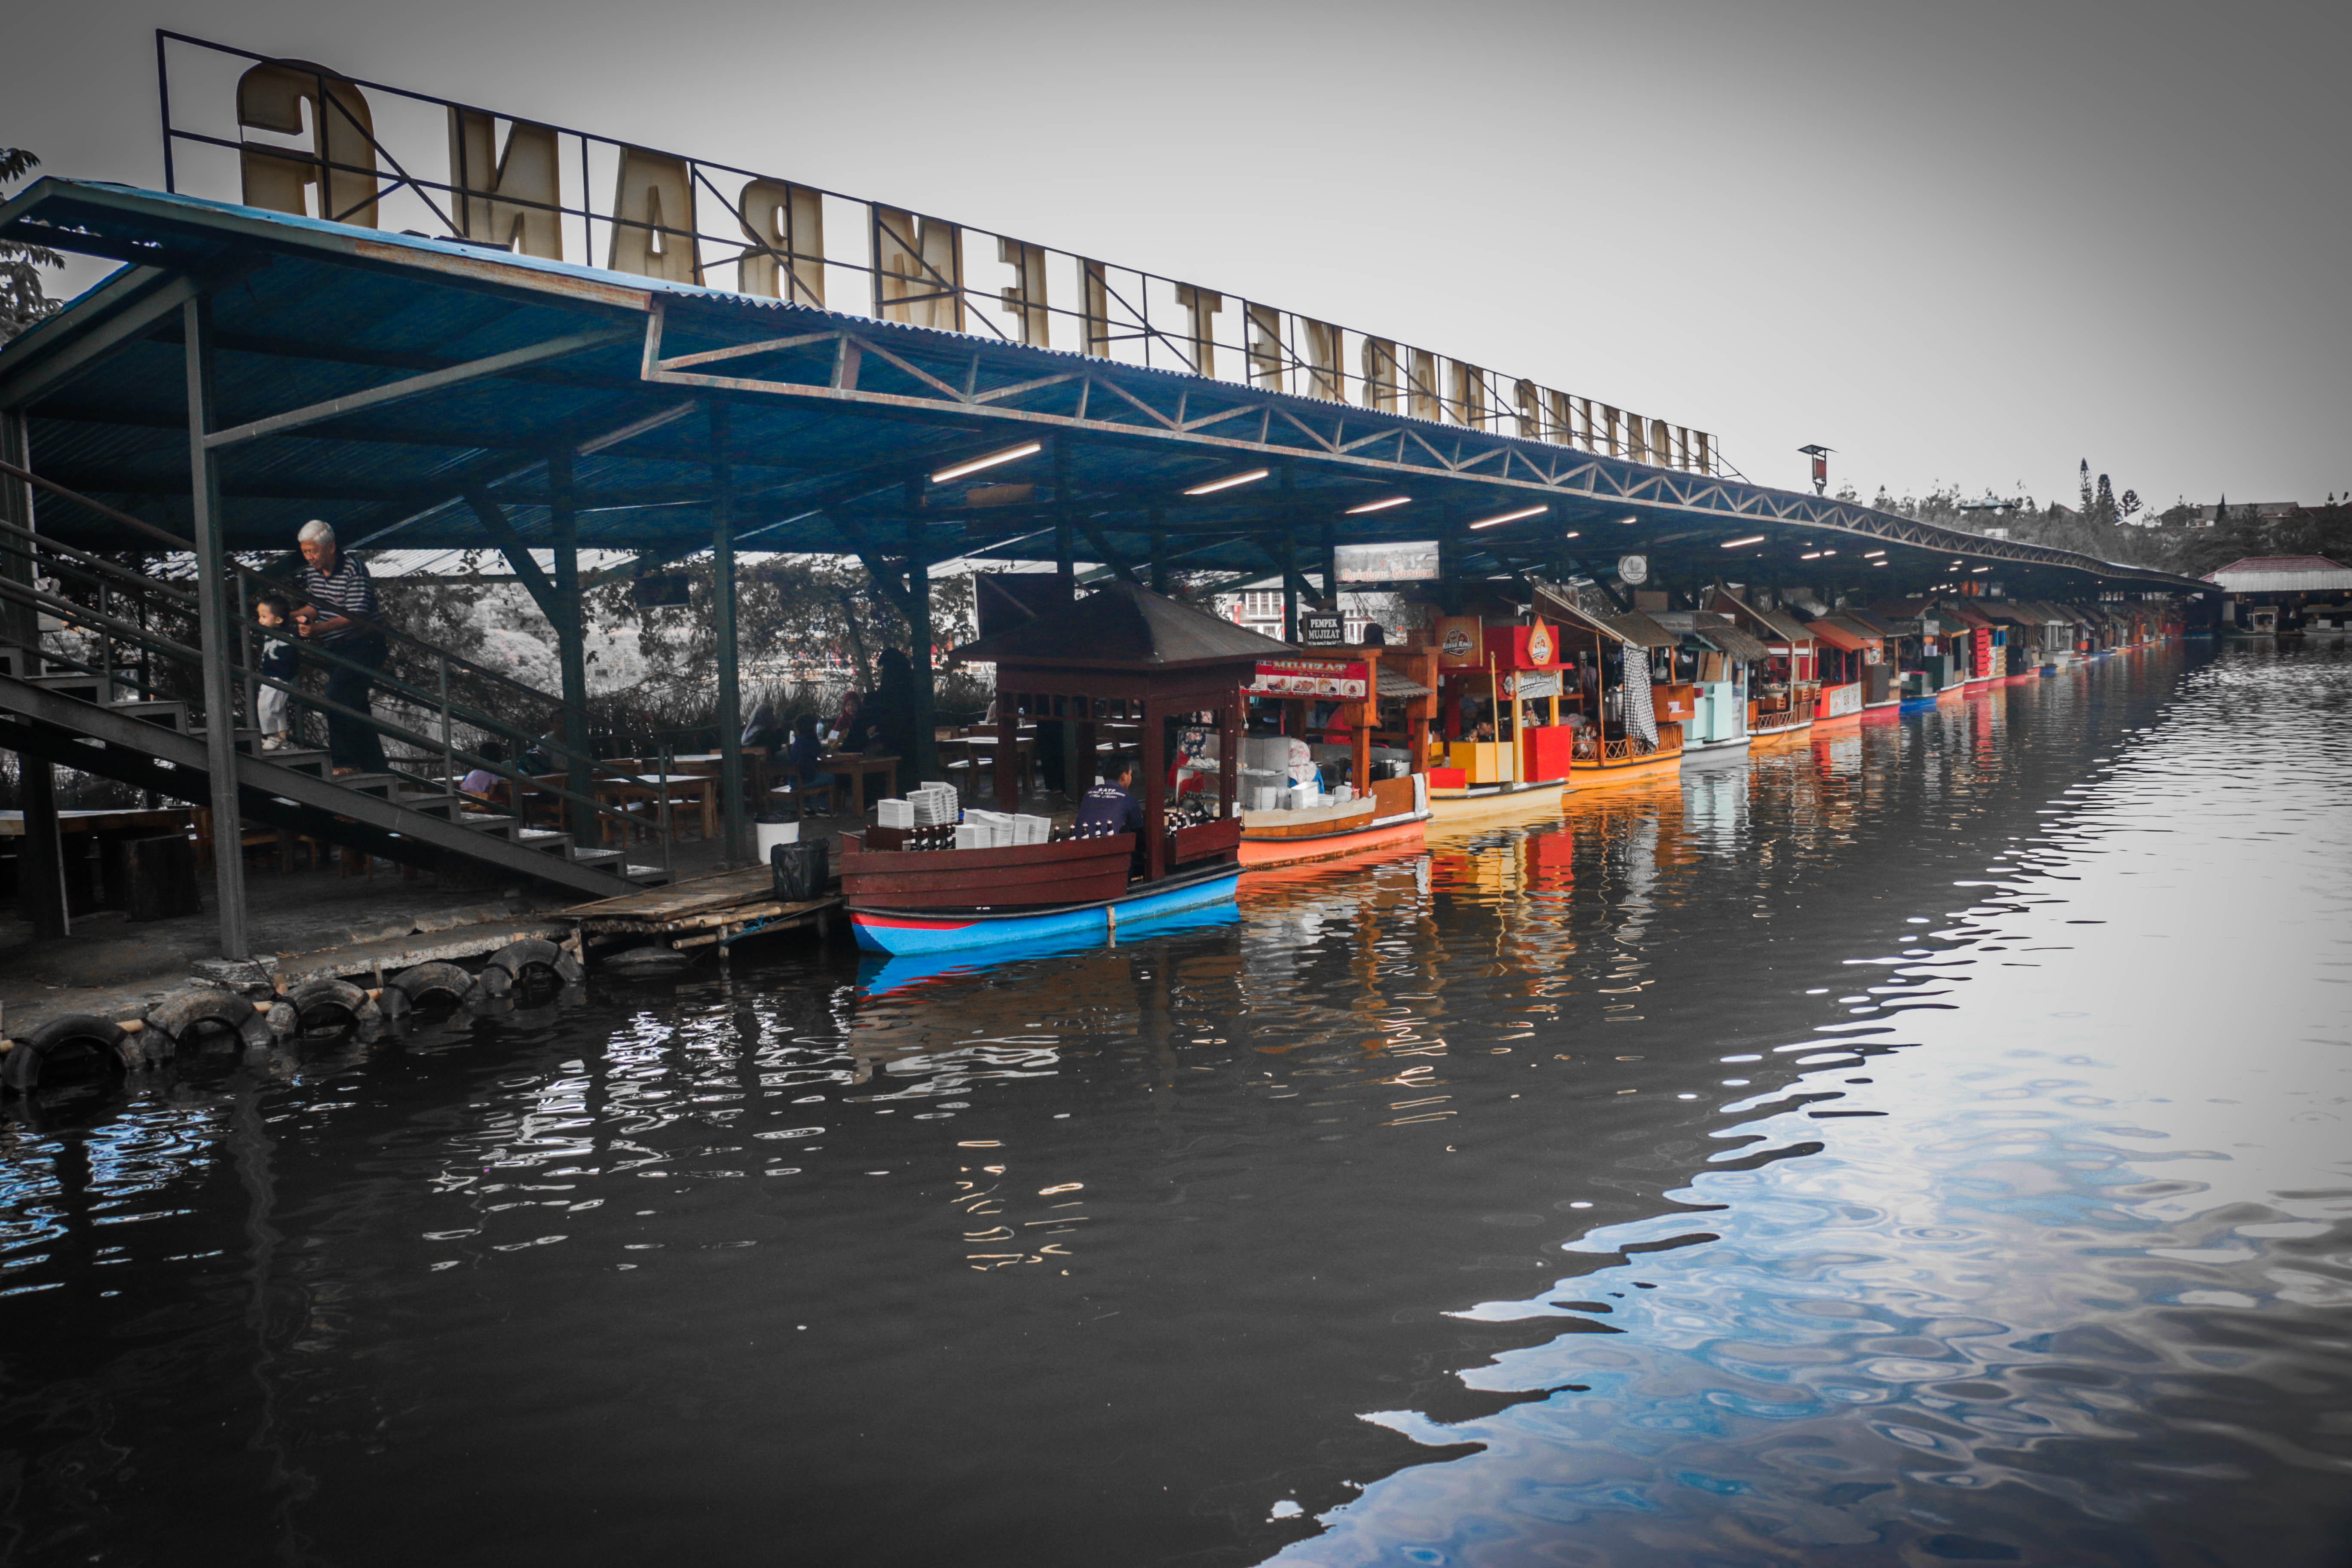 Floating Market Lembang Nikmati Jajanan Khas Sunda Wisata Menuju Pasar